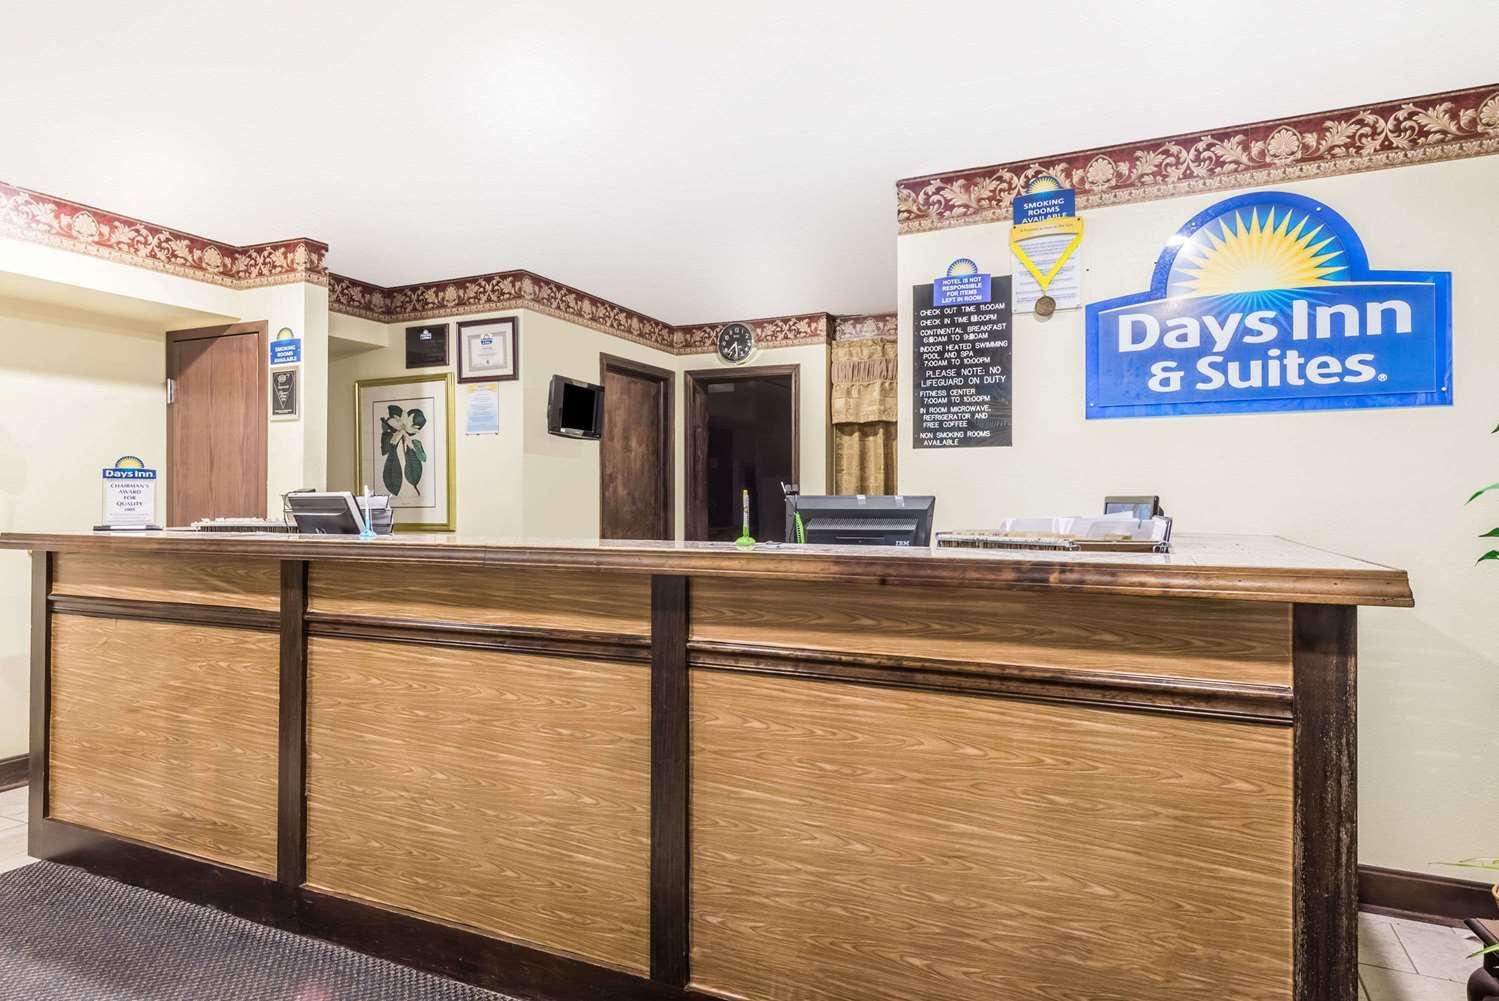 Lobby - Days Inn & Suites Girard